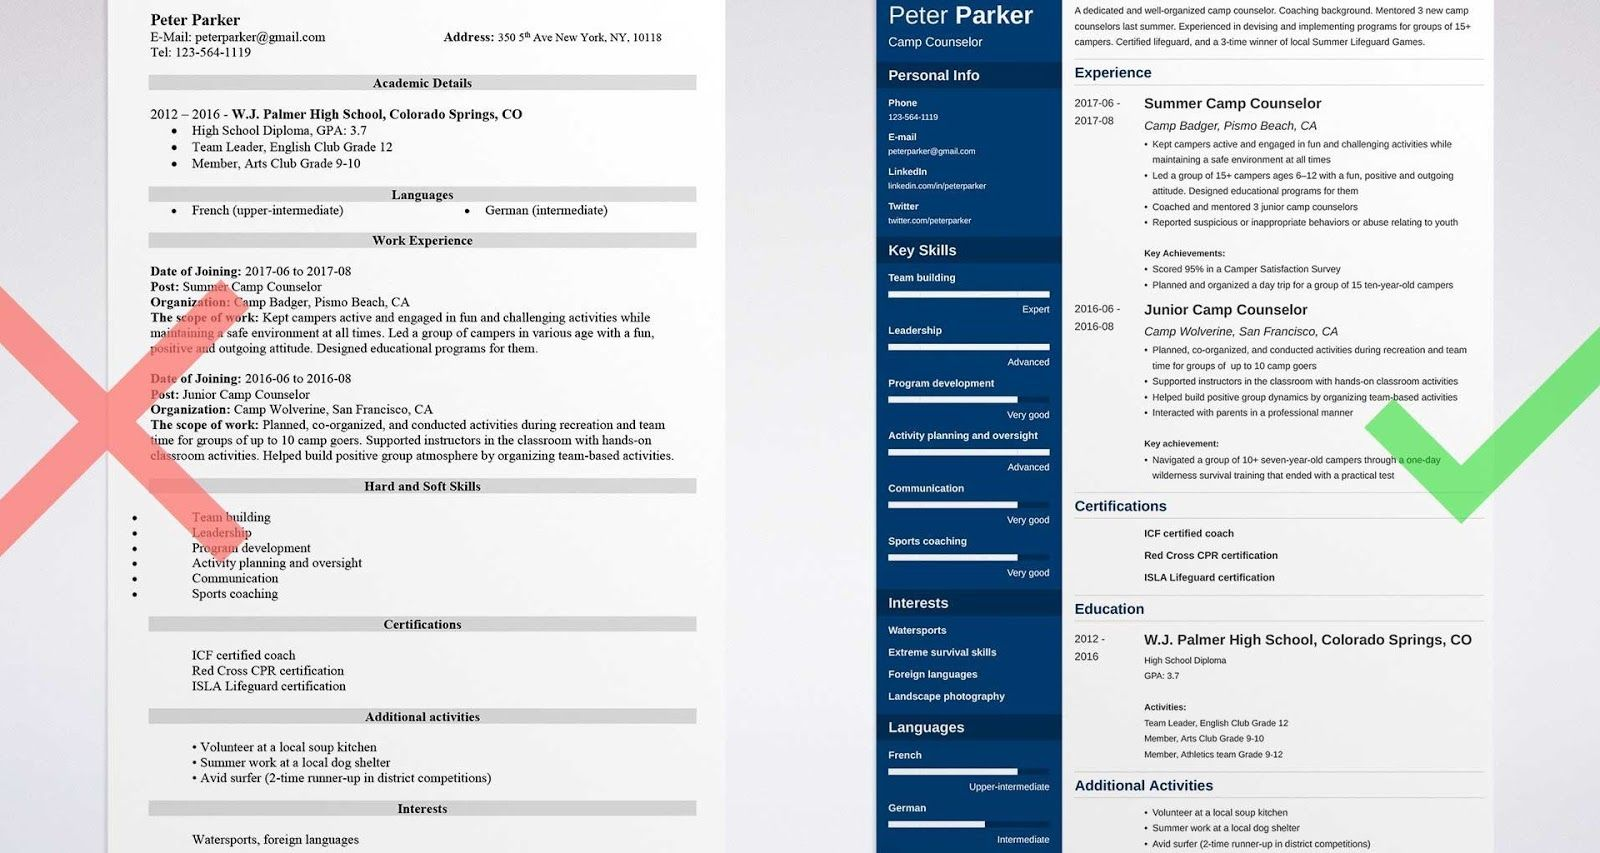 school counselor resume sample, school counselor resume